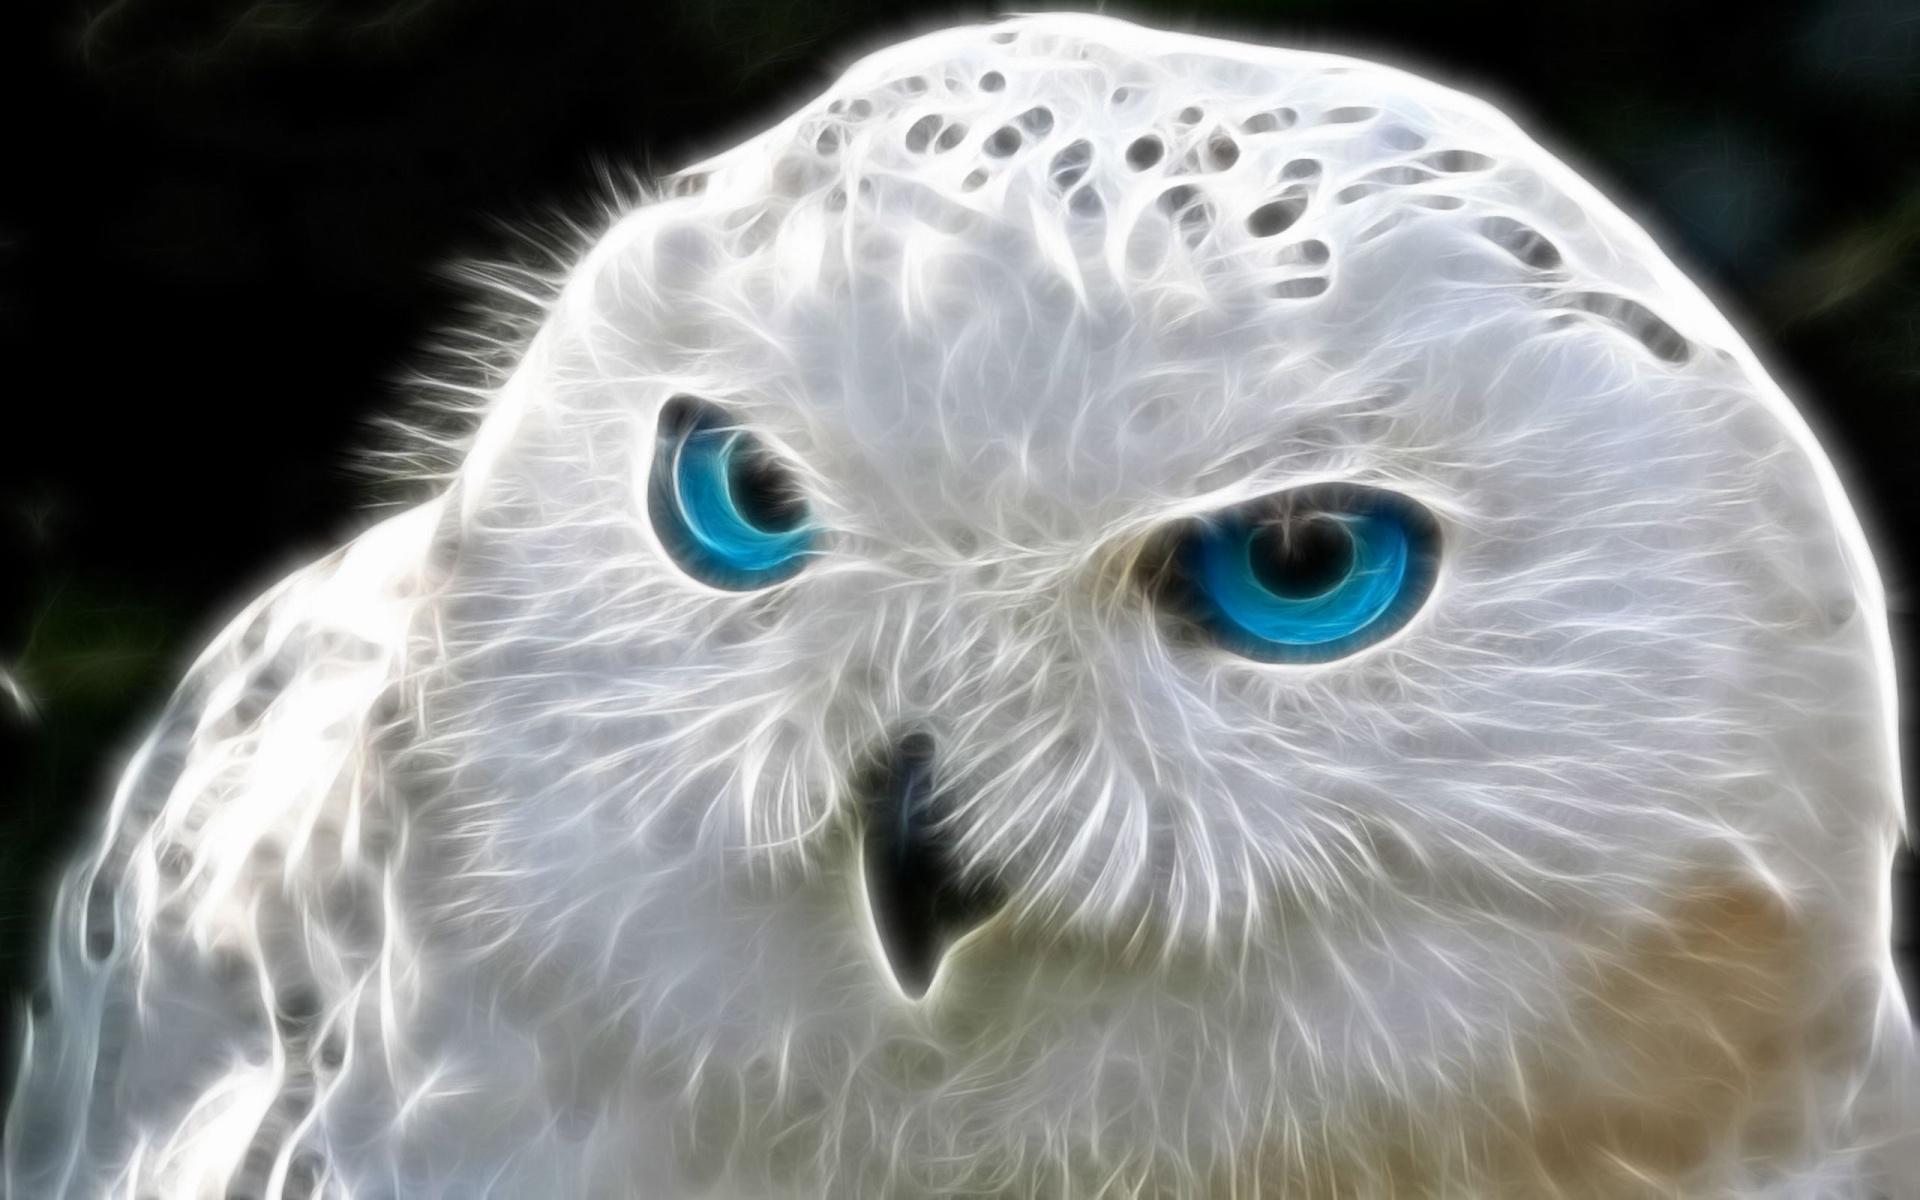 Stunning White Owl Wallpaper 1920x1200px